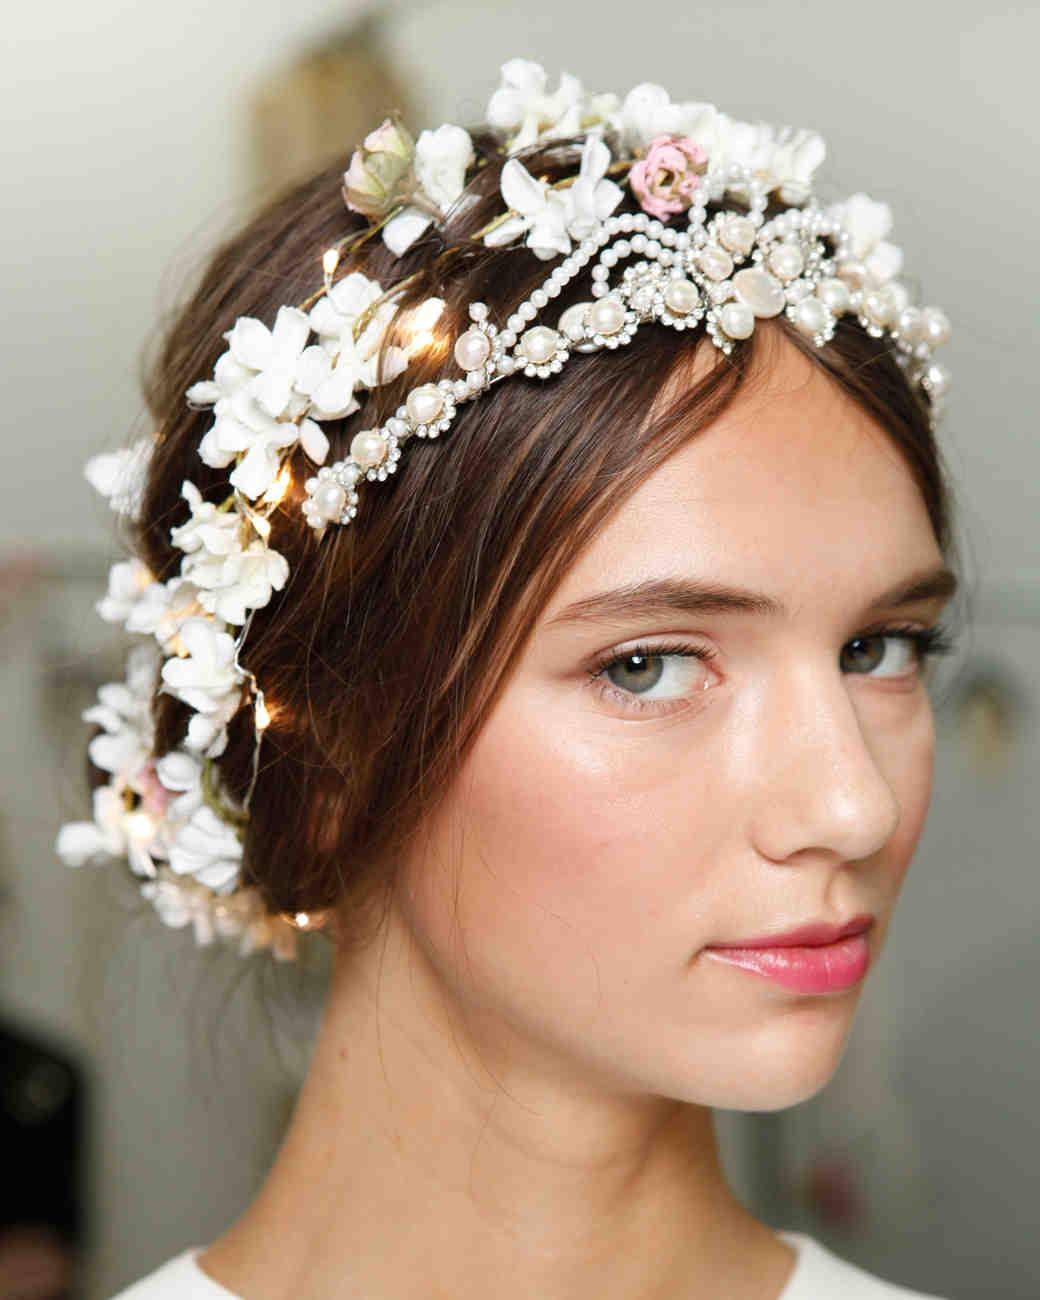 floral-hair-trend-reem-acra-fall2015-d111643-034-1114.jpg